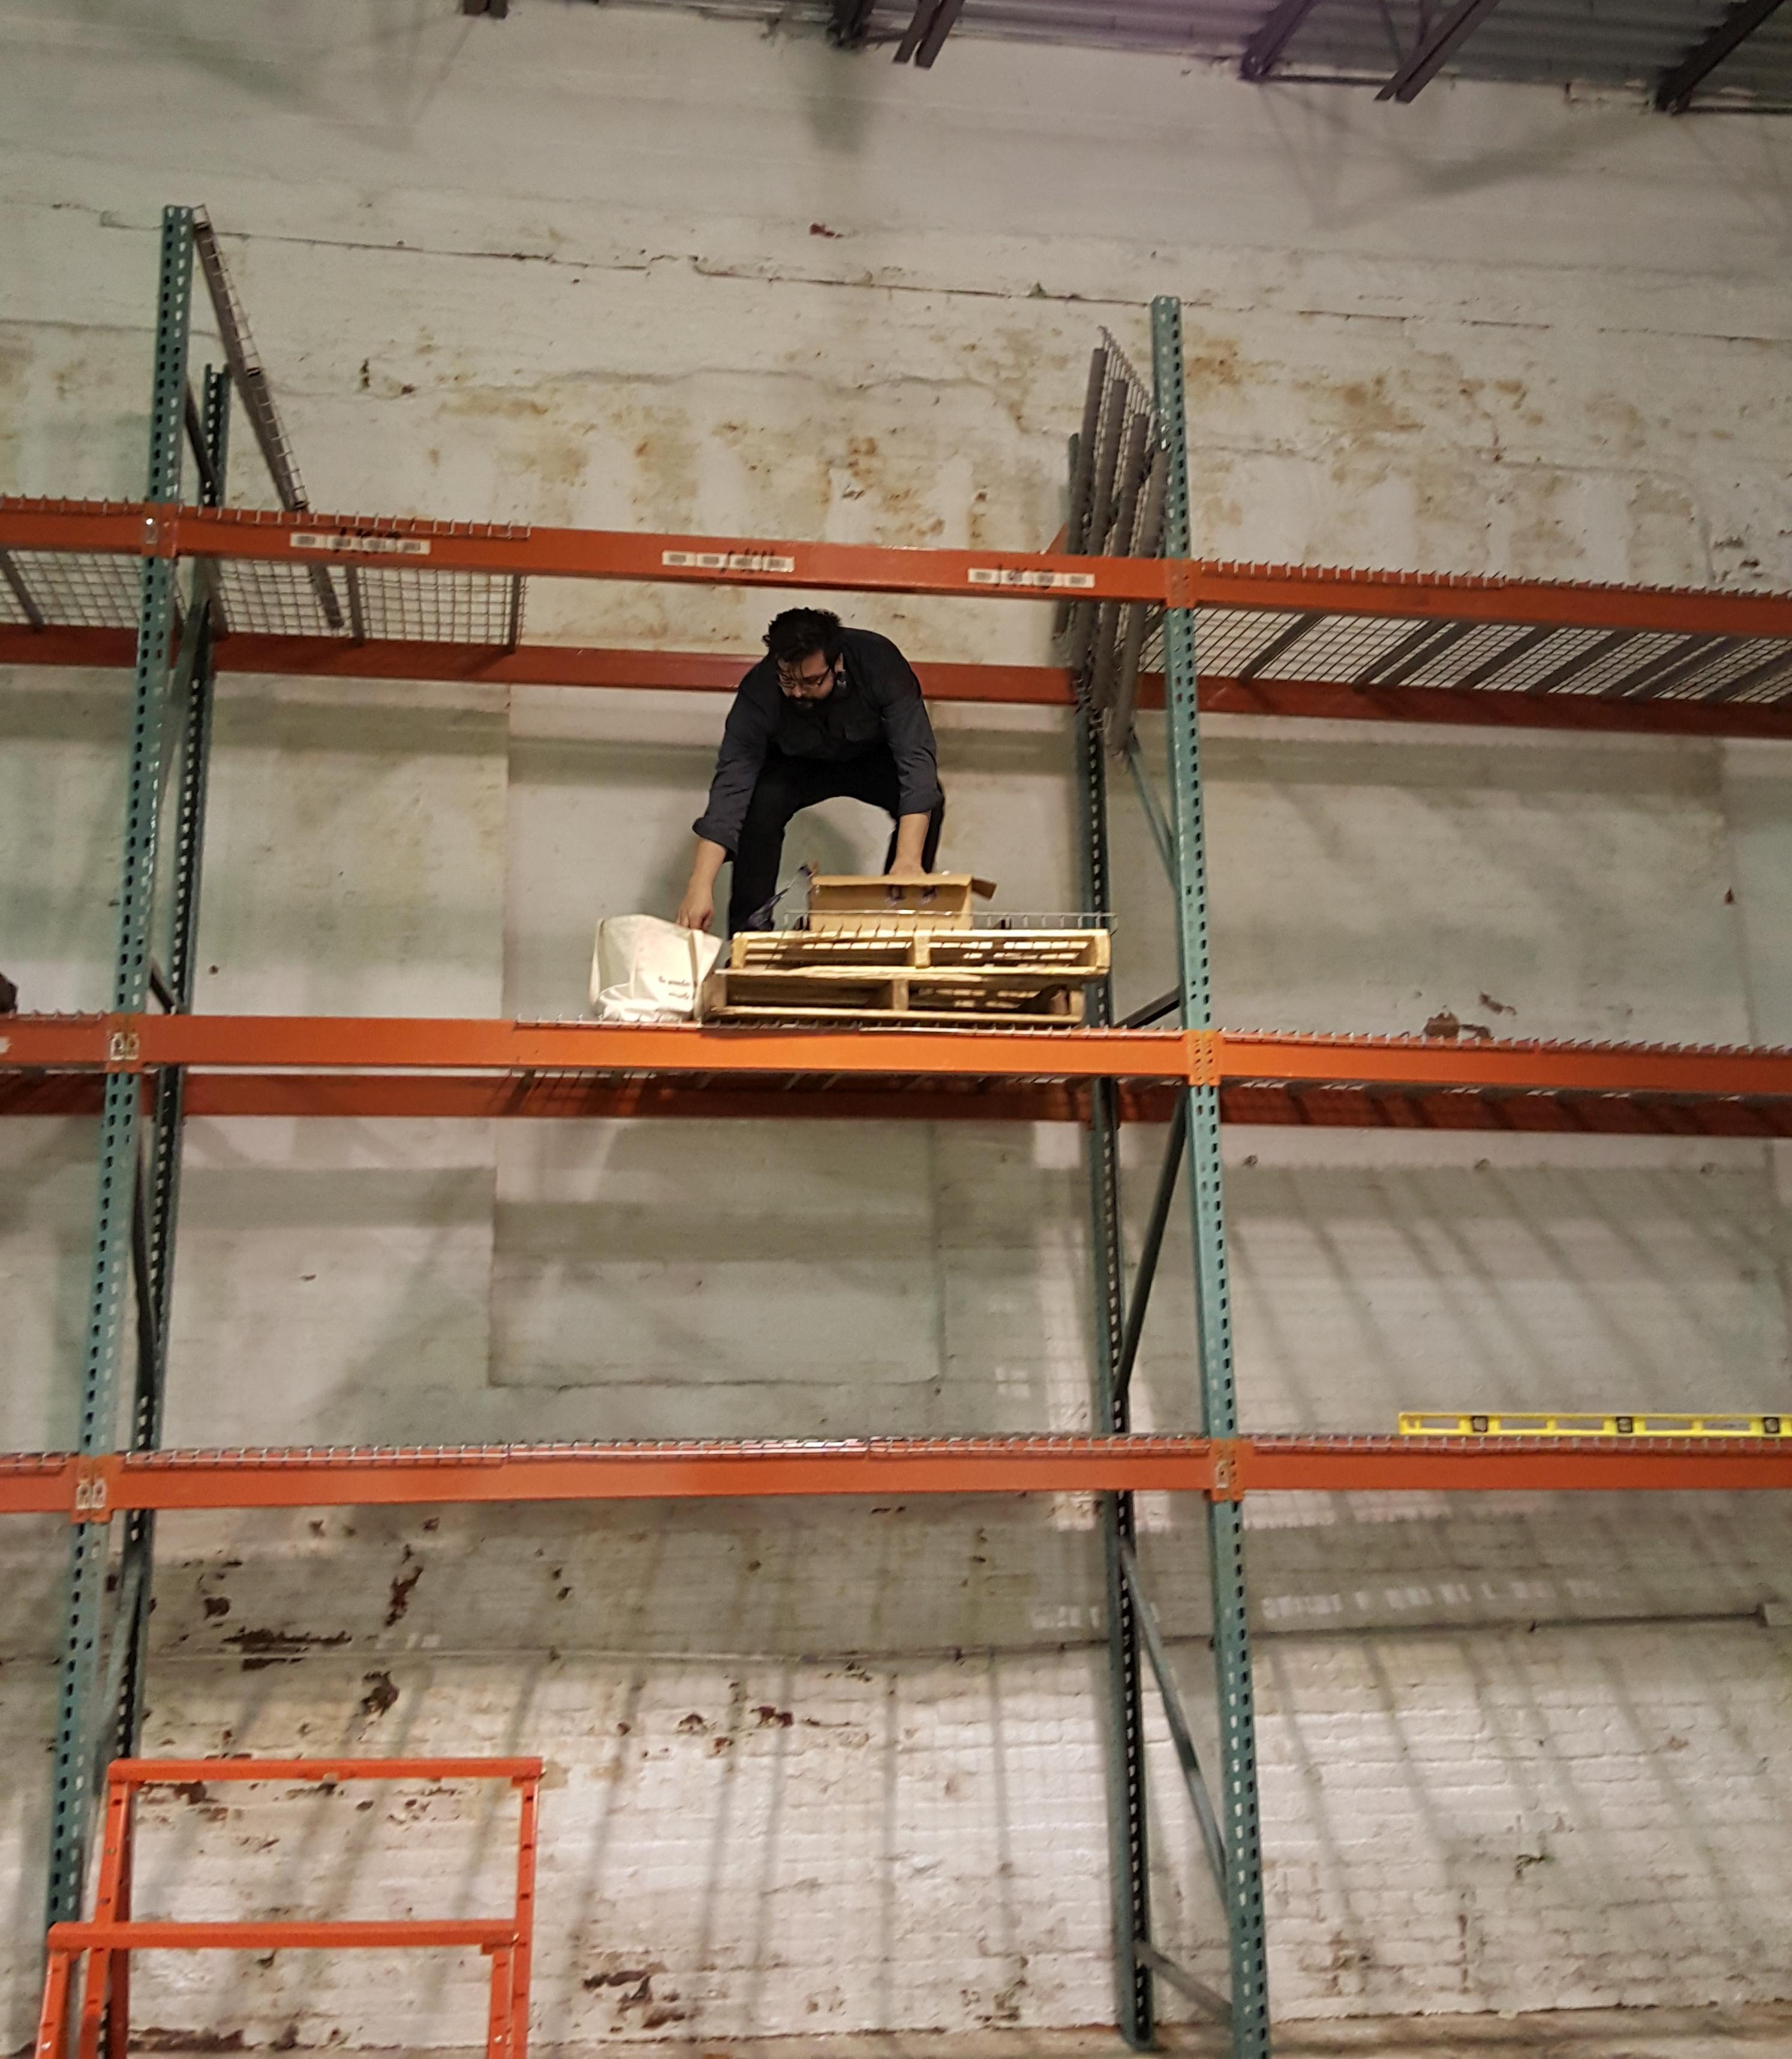 Sawmaking returns to 26th Street 4